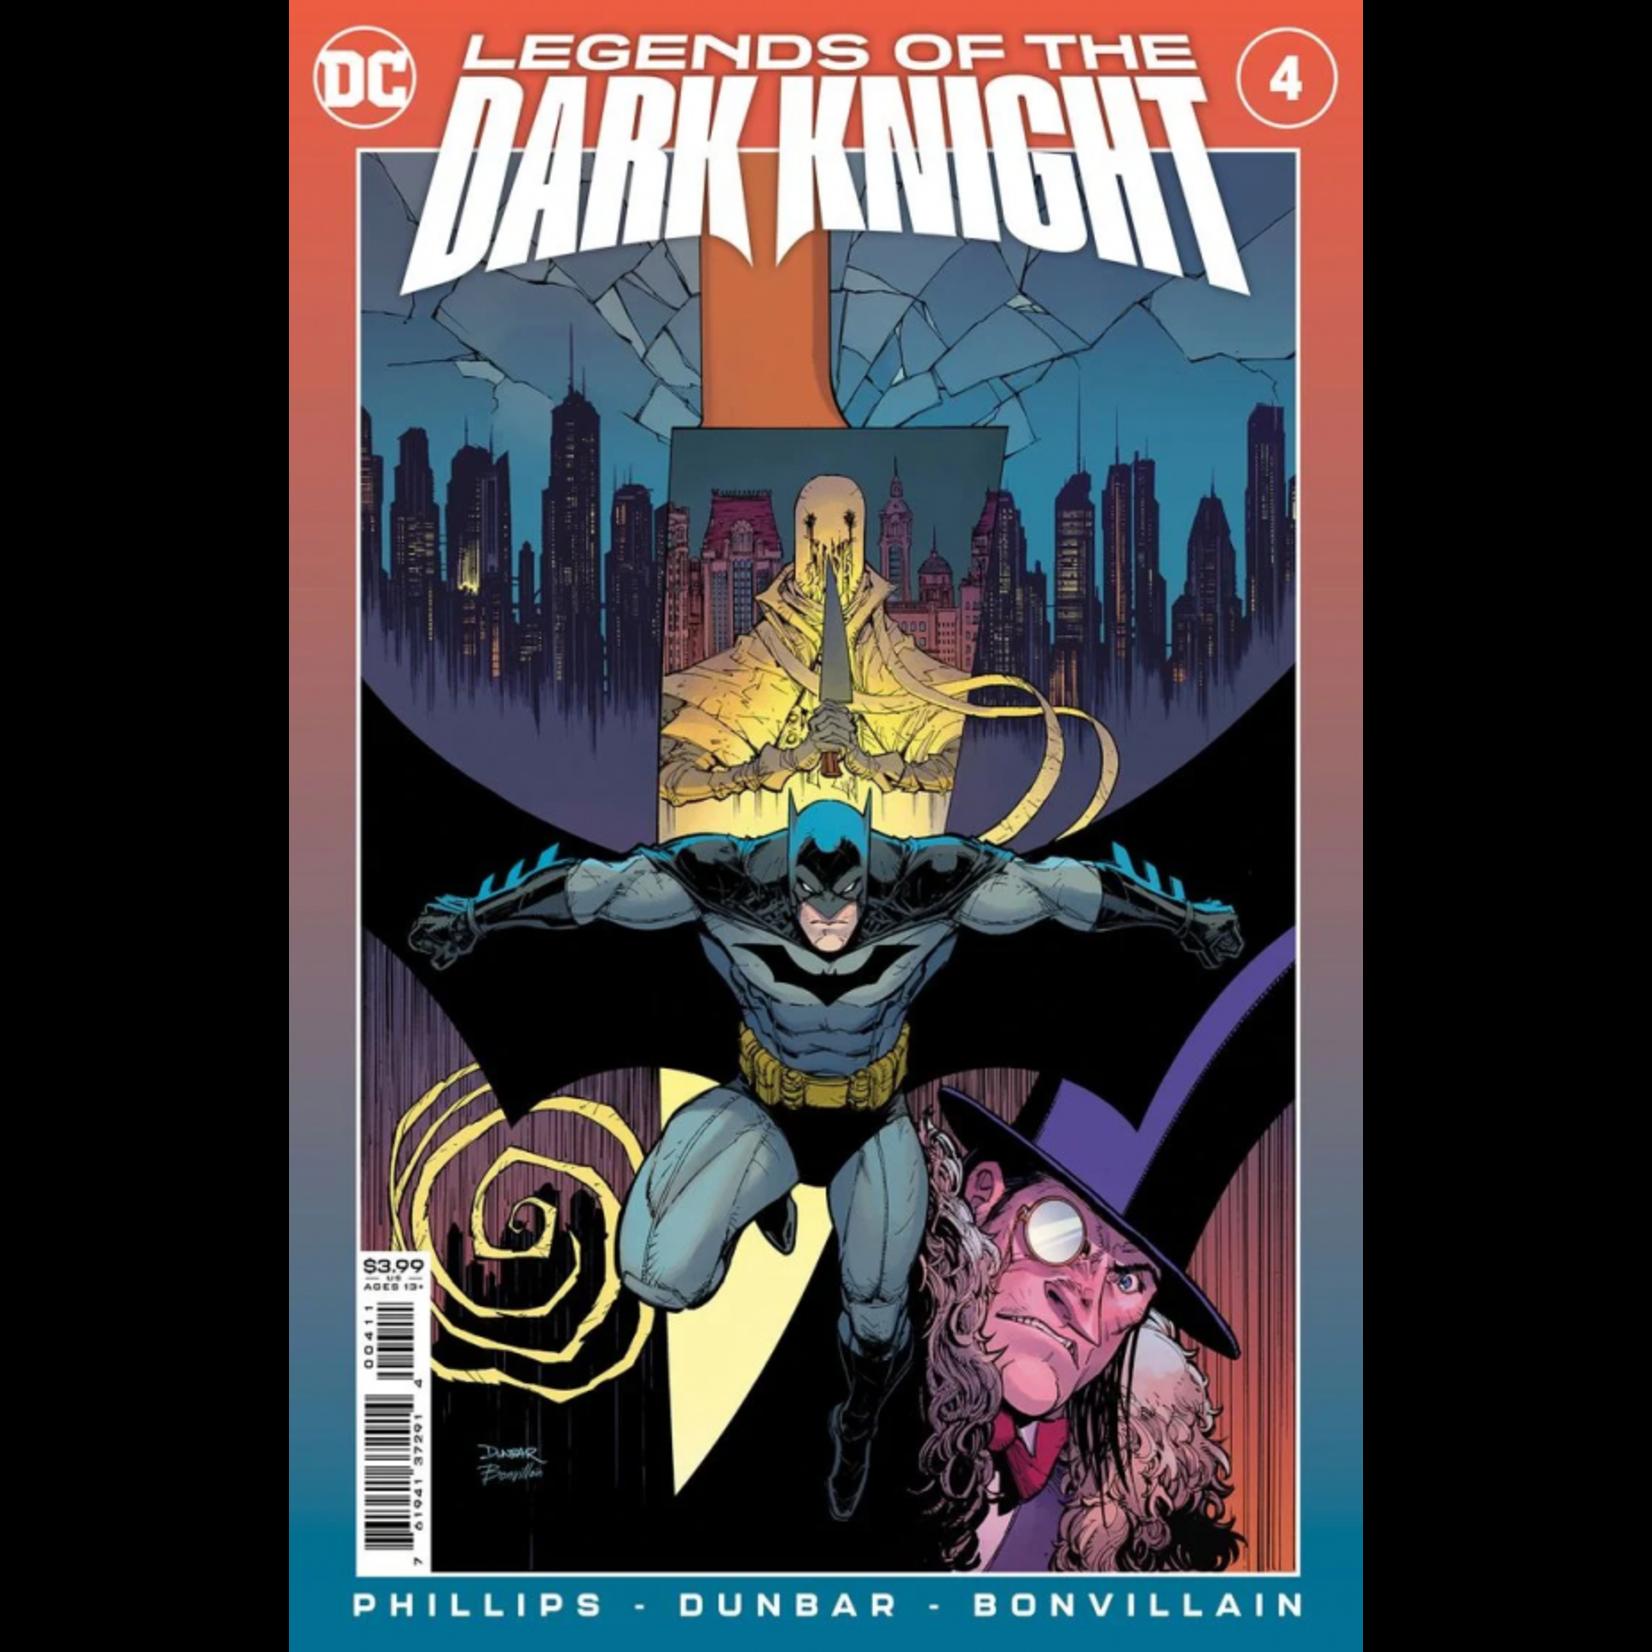 DC Comics Legends of the Dark Knight #4